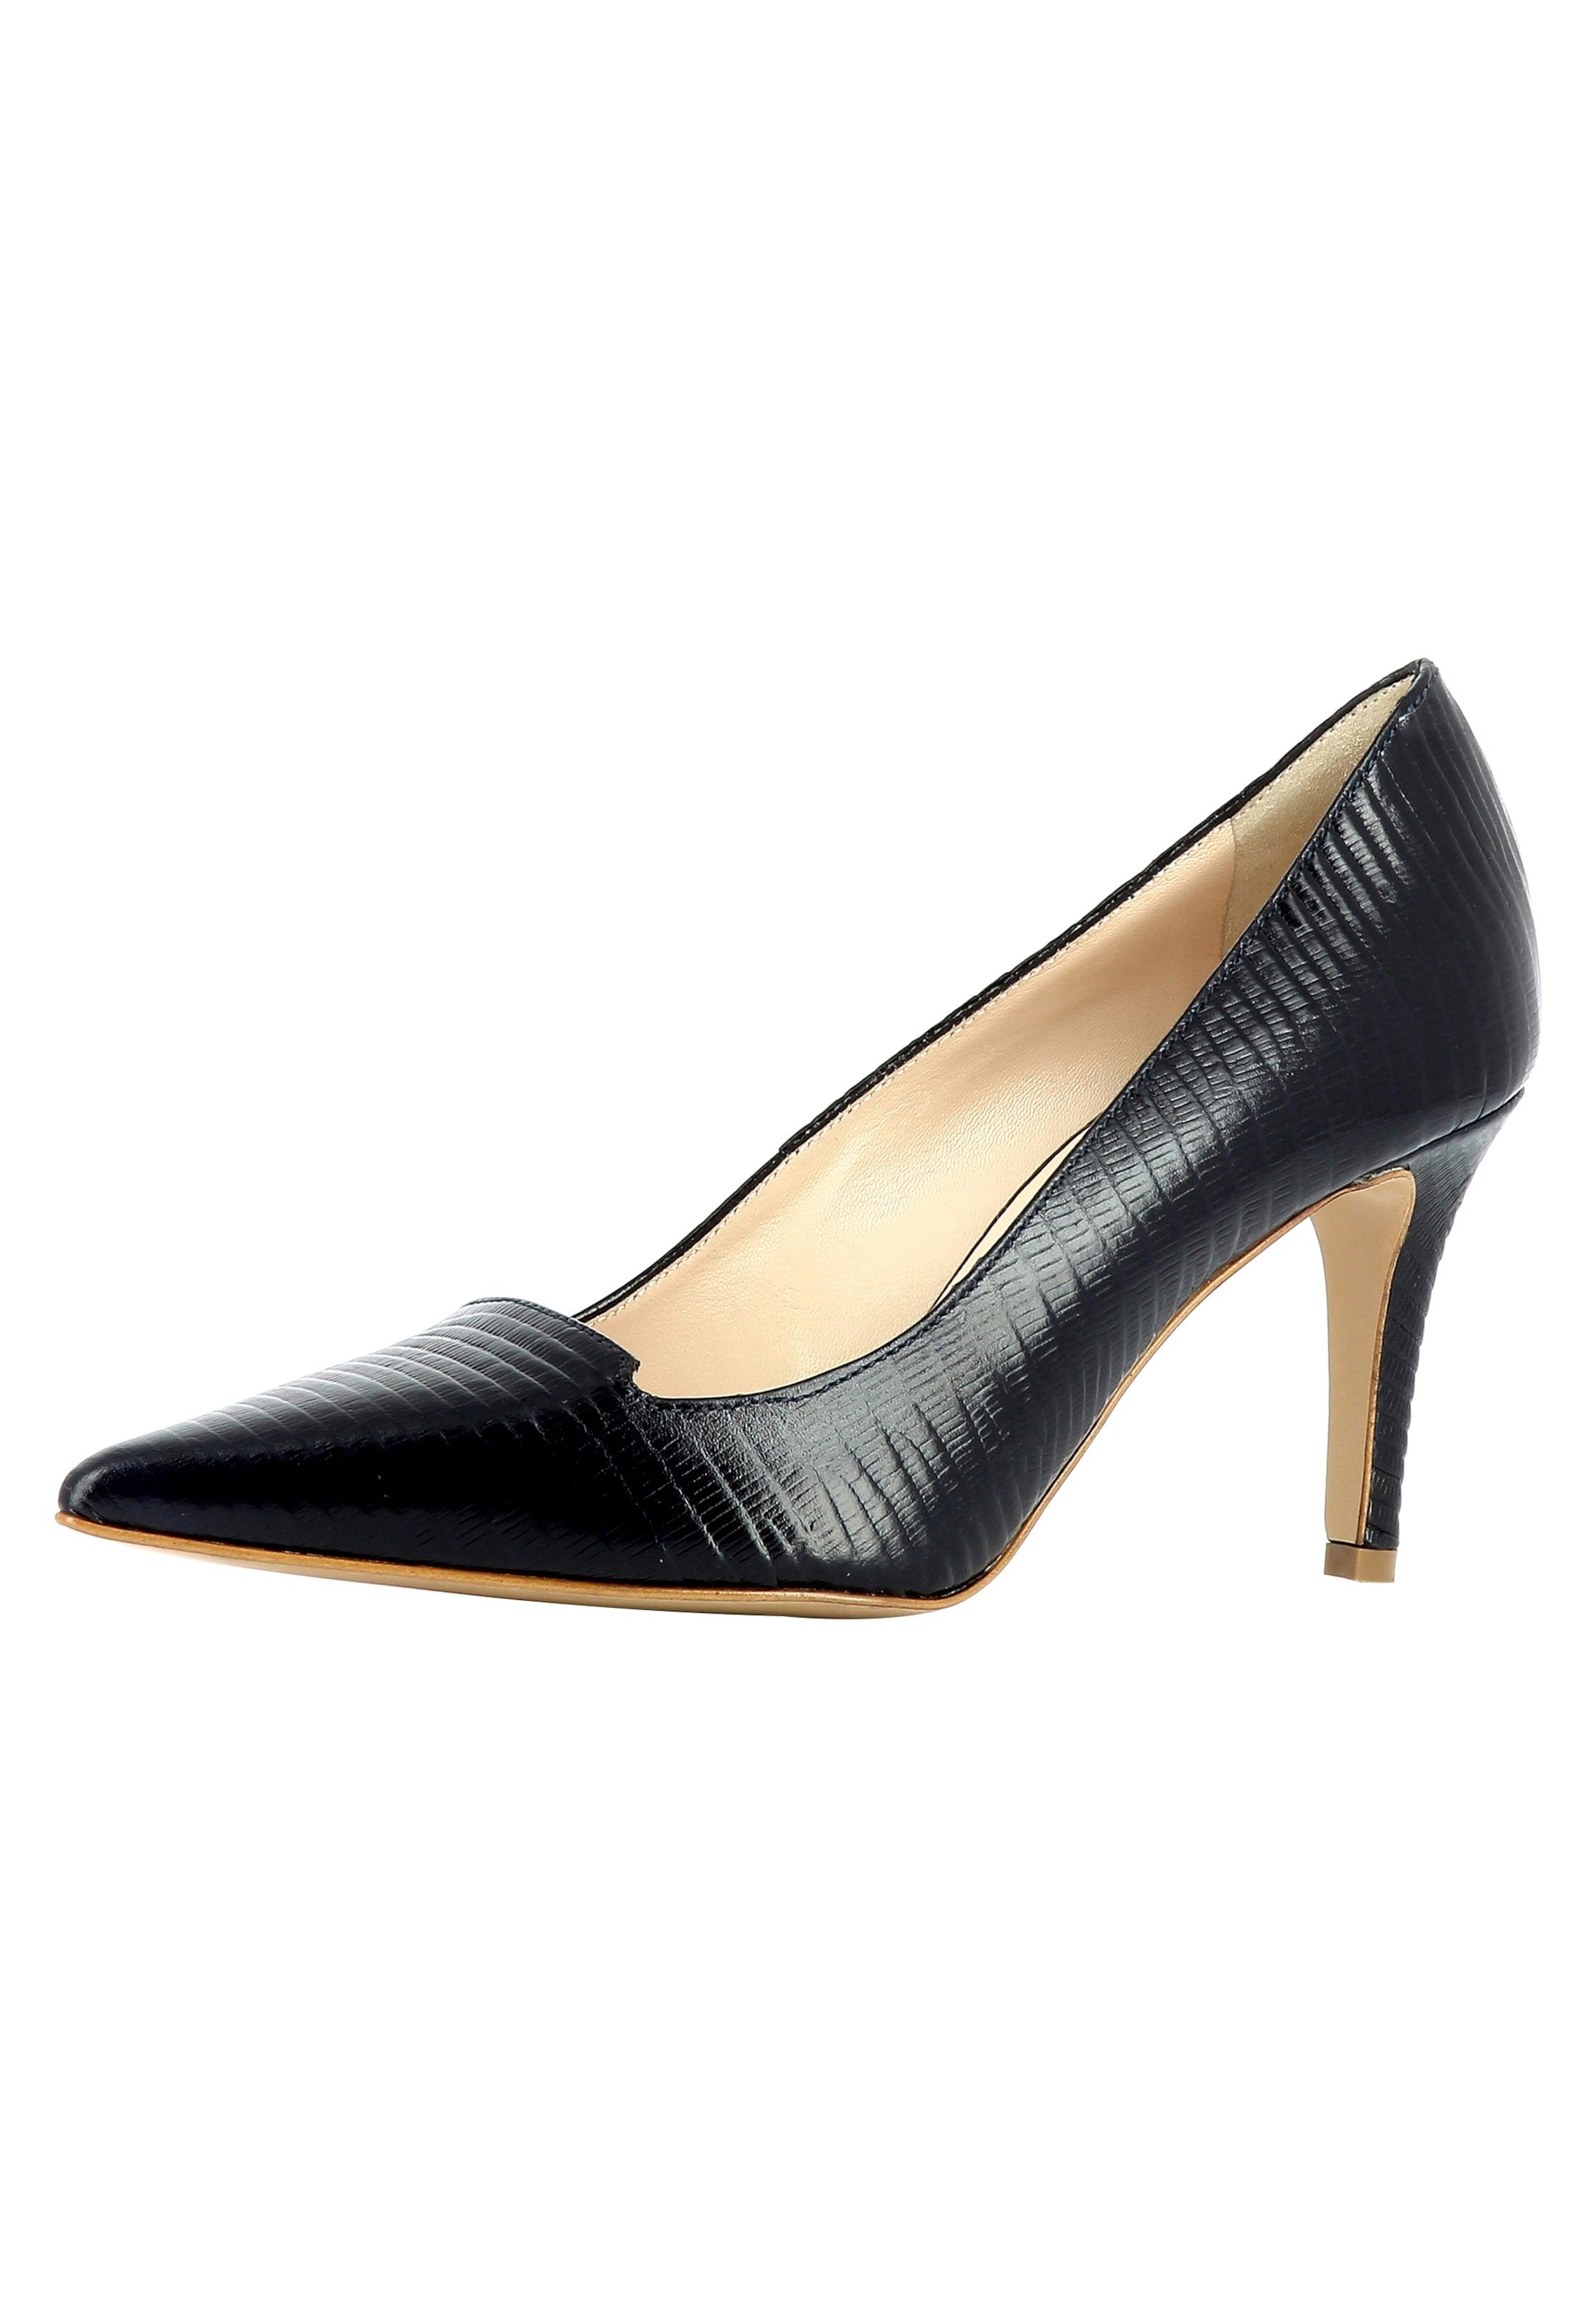 Haltbare Mode billige Schuhe EVITA | Pumps Schuhe Gut getragene Schuhe